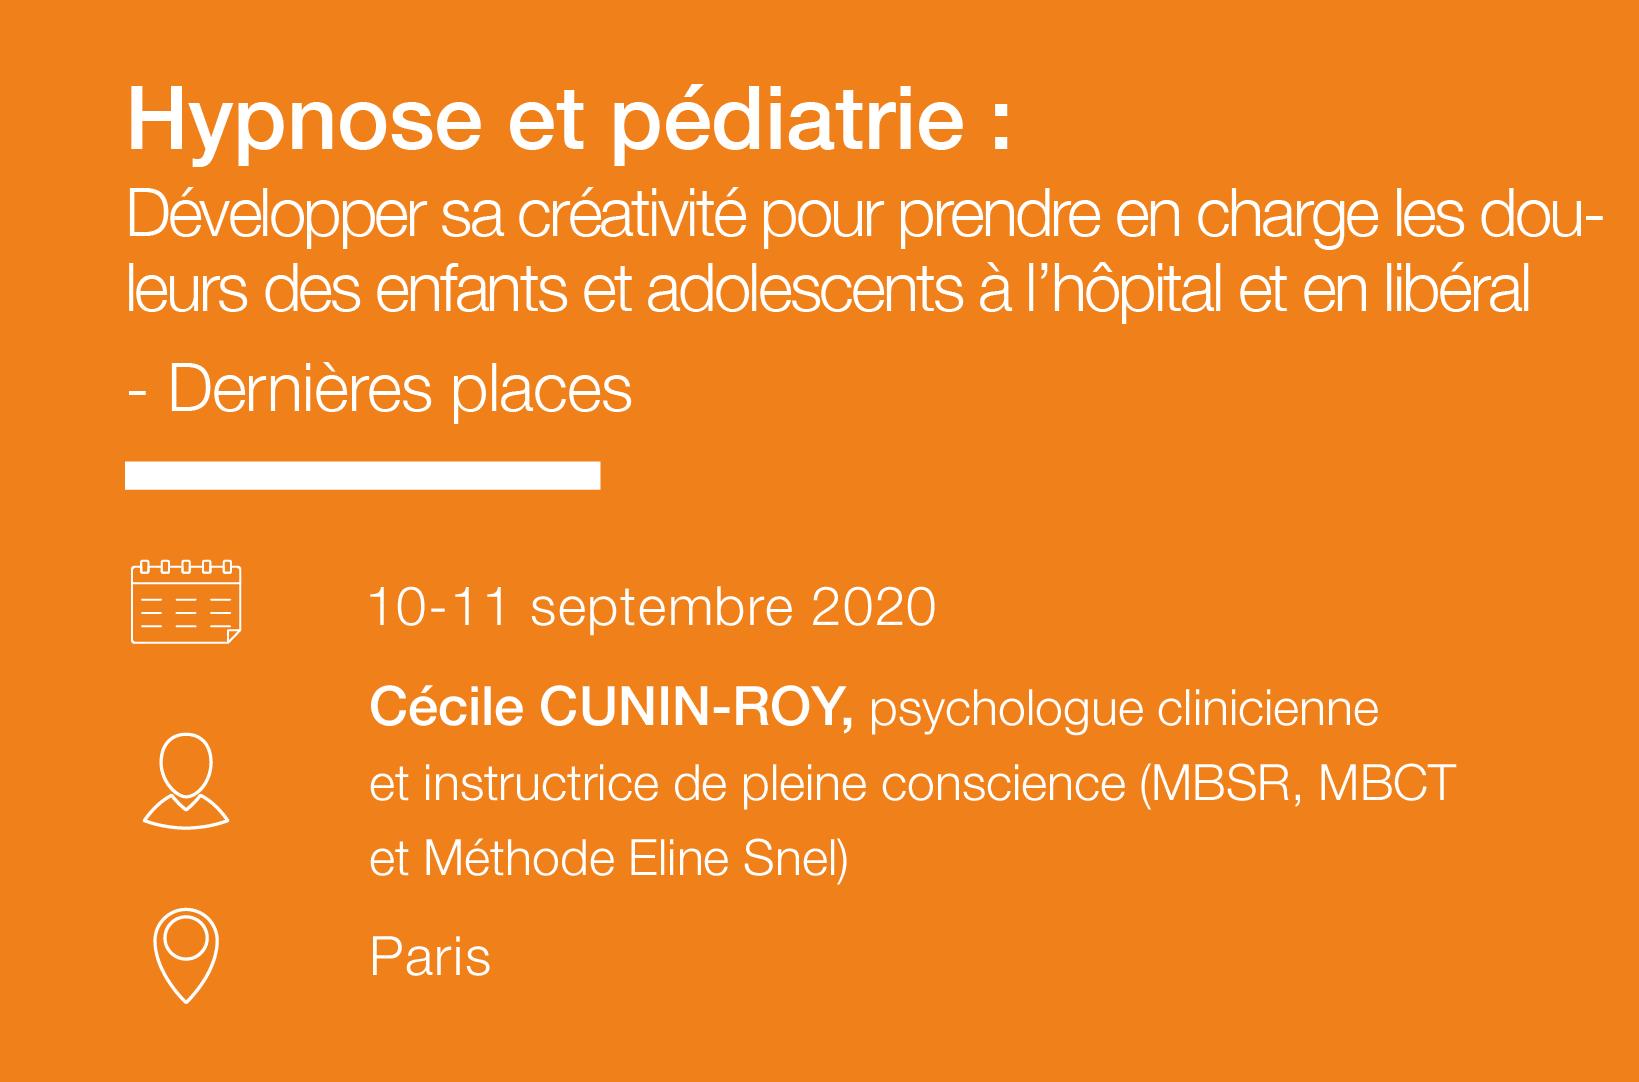 Seminaire Hypnose et pediatrie - IFH